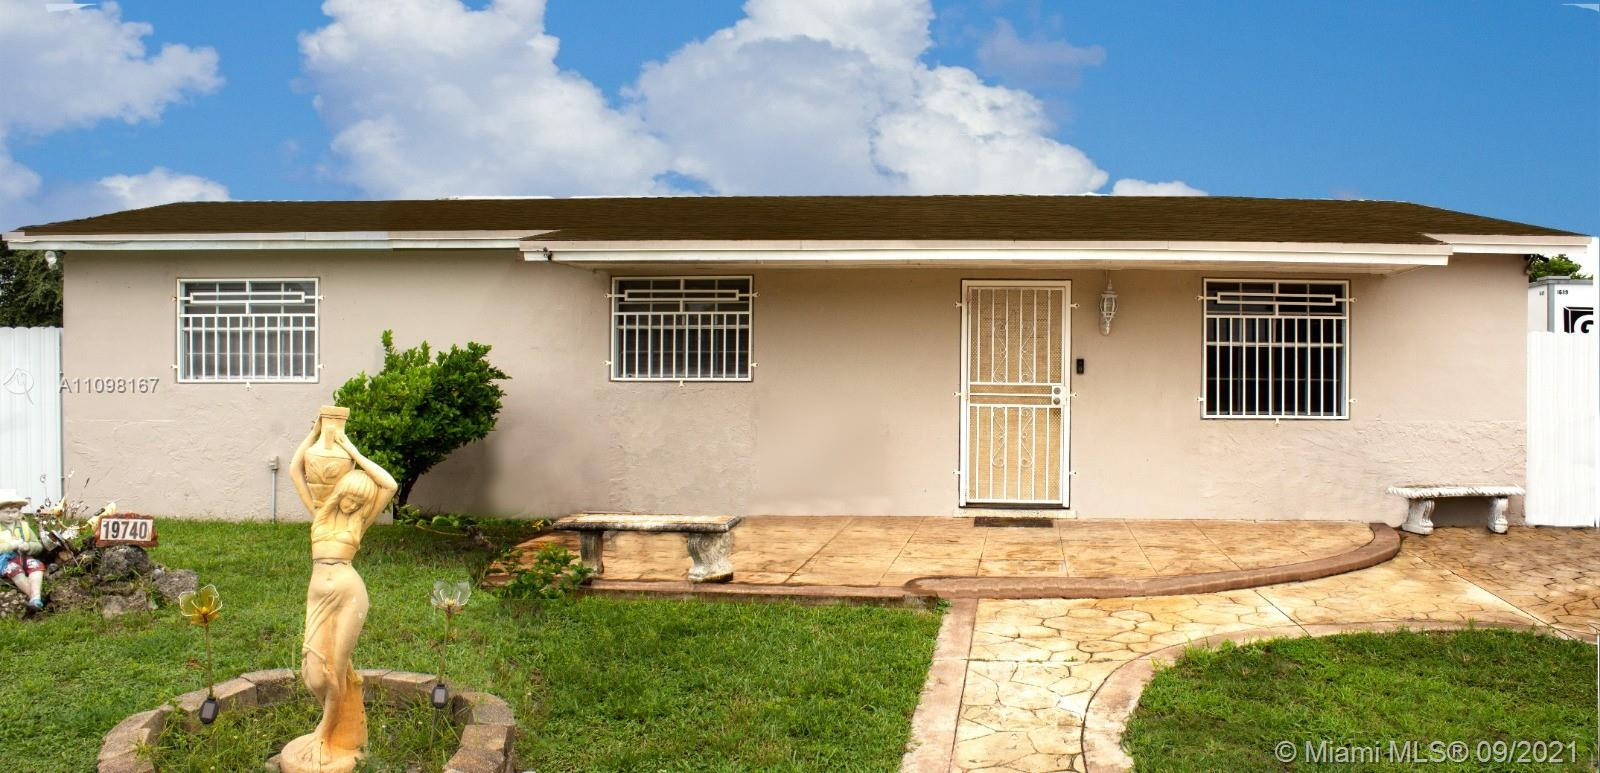 Single Family Home,For Sale,19740 NW 44th Ct, Miami Gardens, Florida 33055,Brickell,realty,broker,condos near me